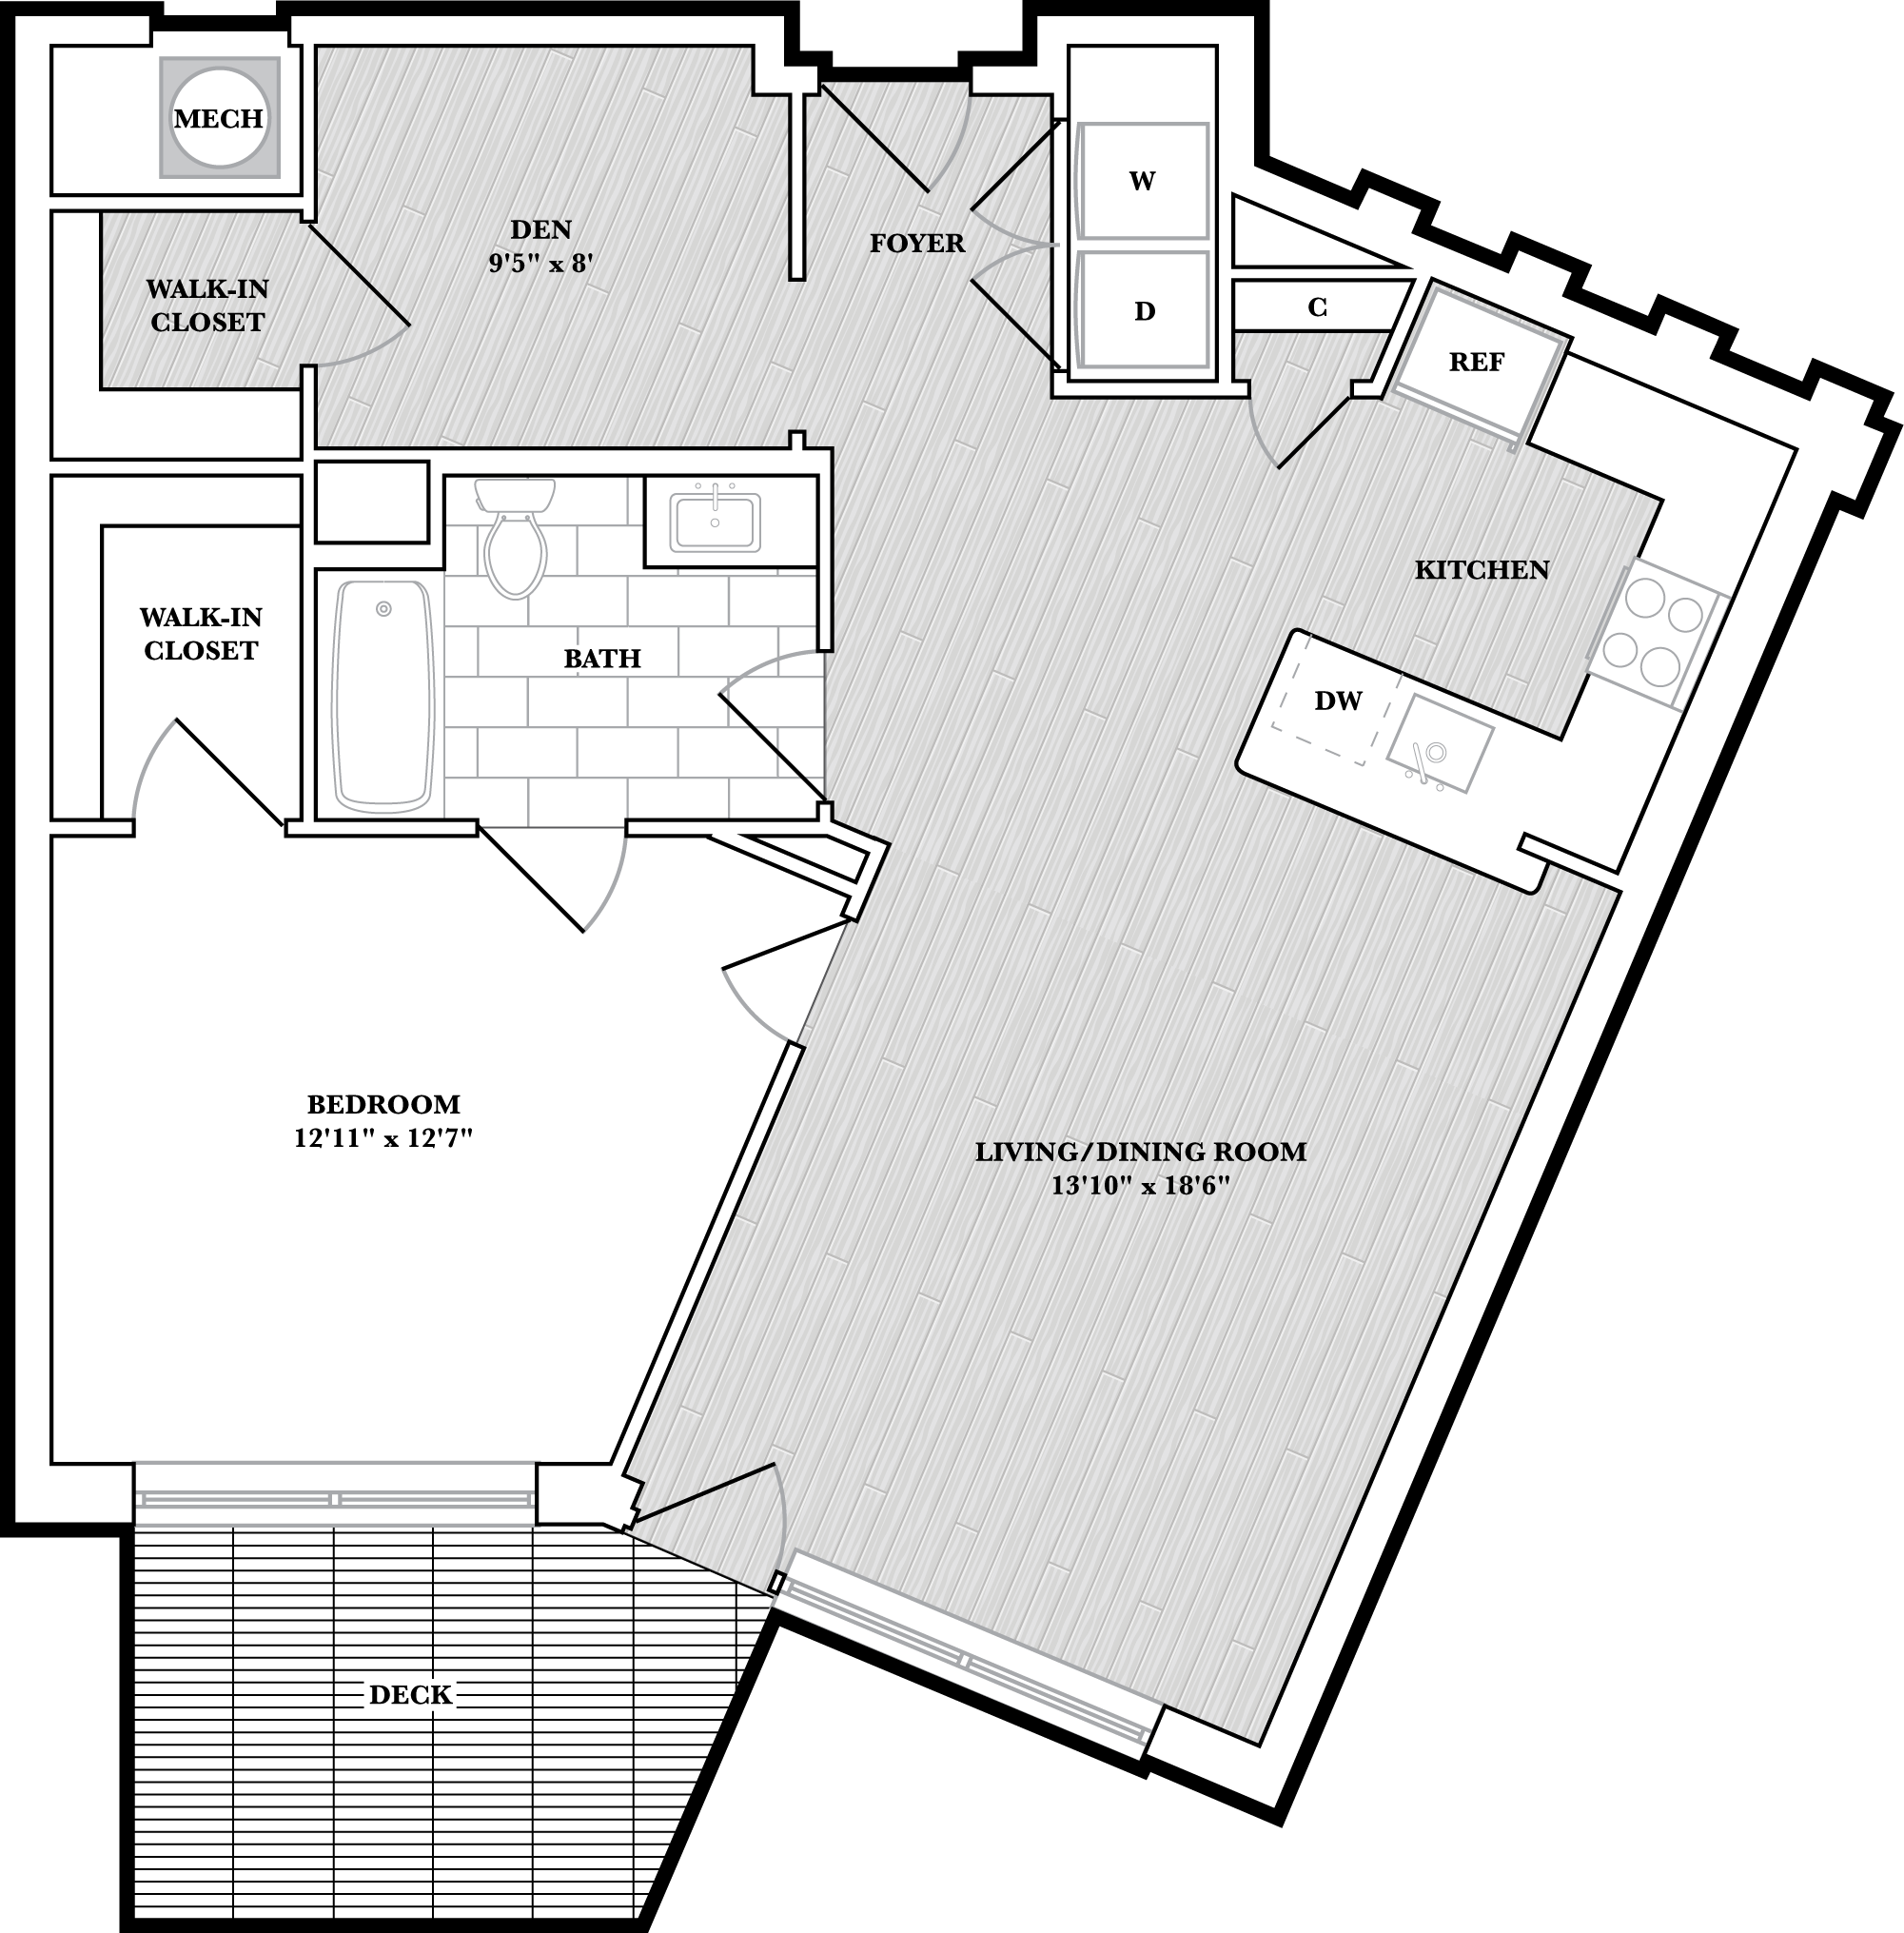 floorplan image of S210